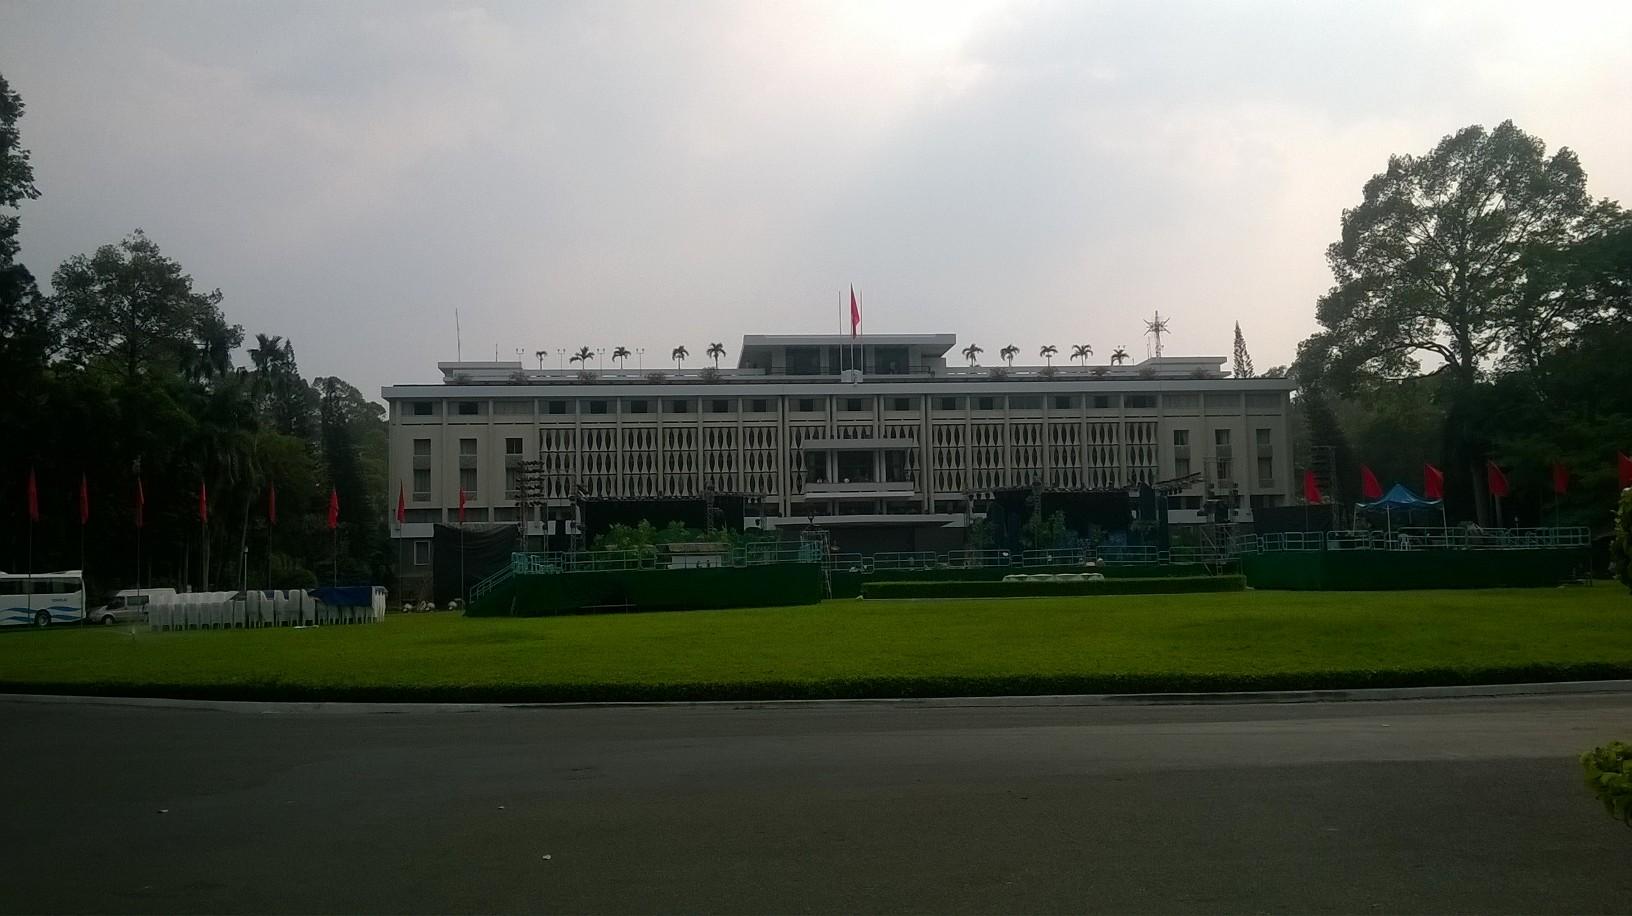 hcmc-reuni-palace-inside-gardens-mar16